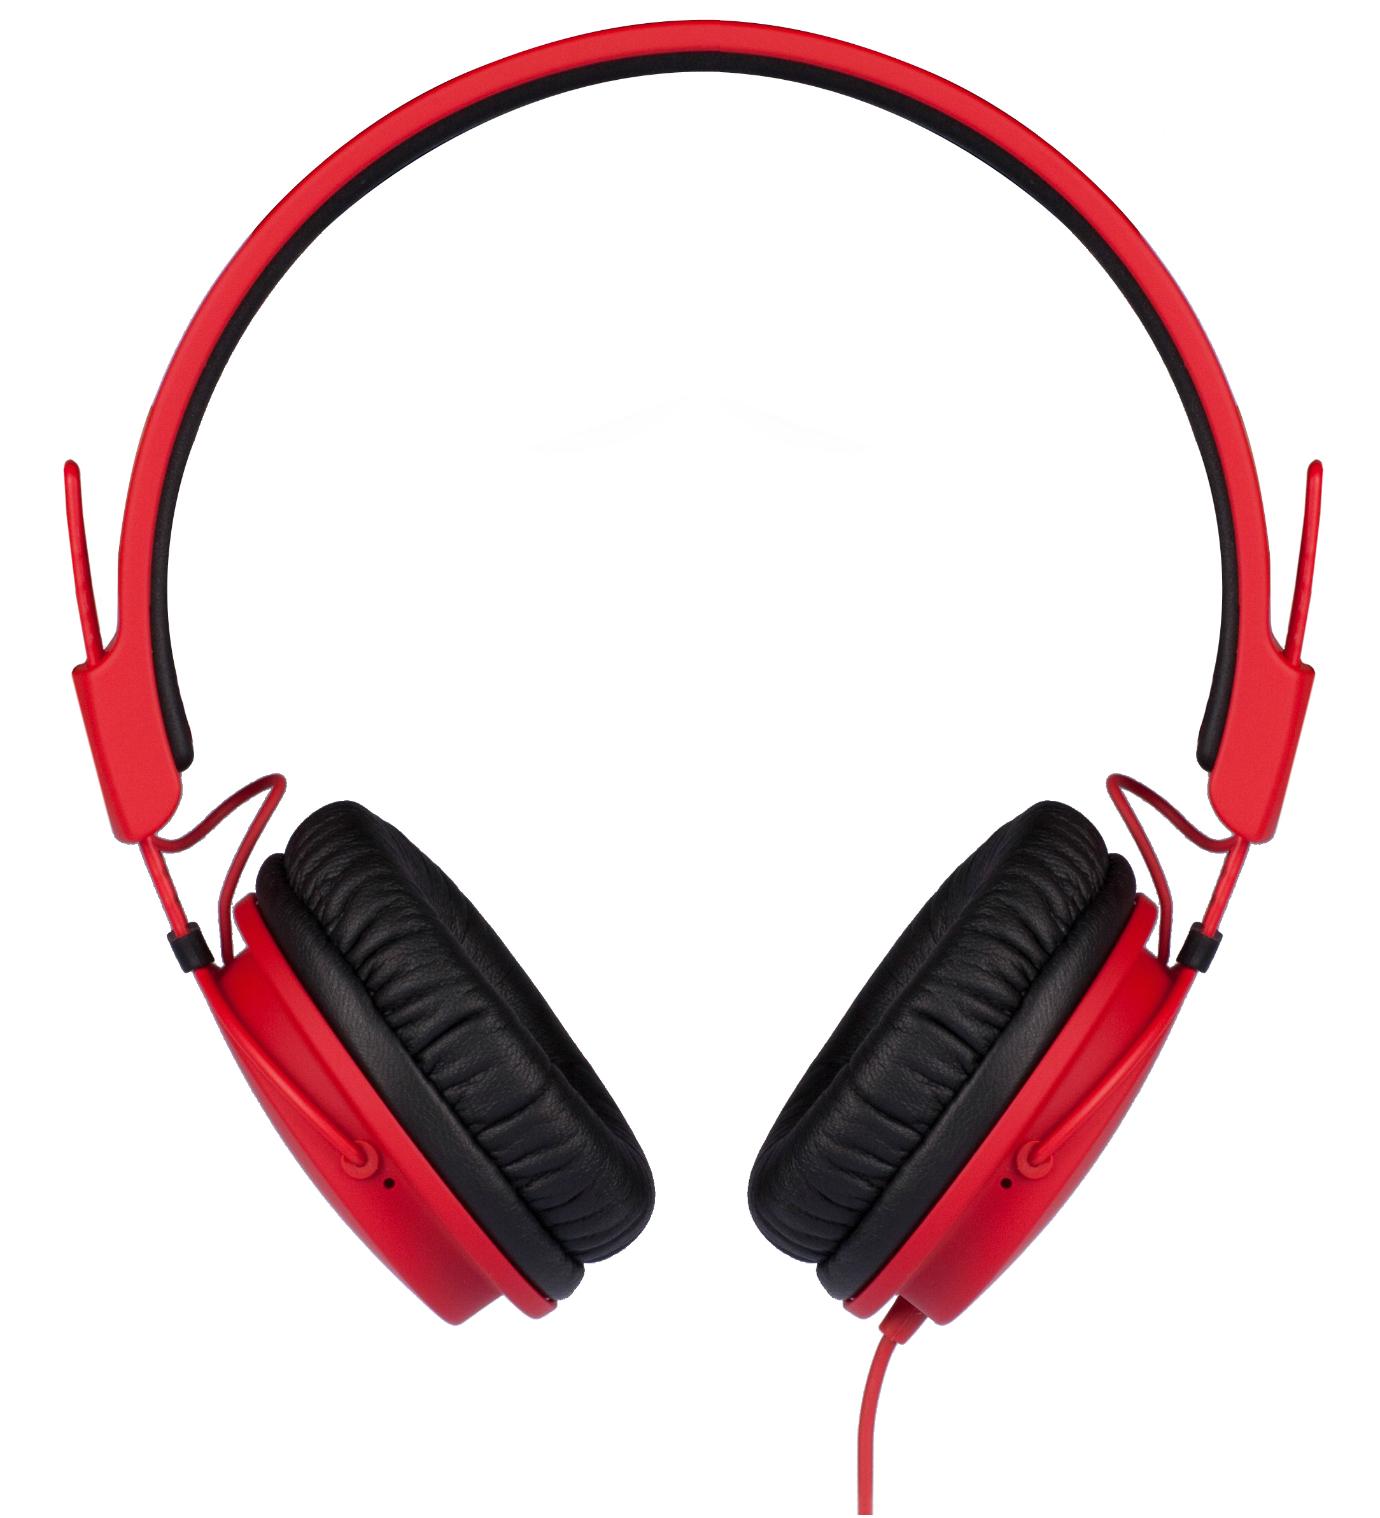 Picture Headphones - ClipArt Best